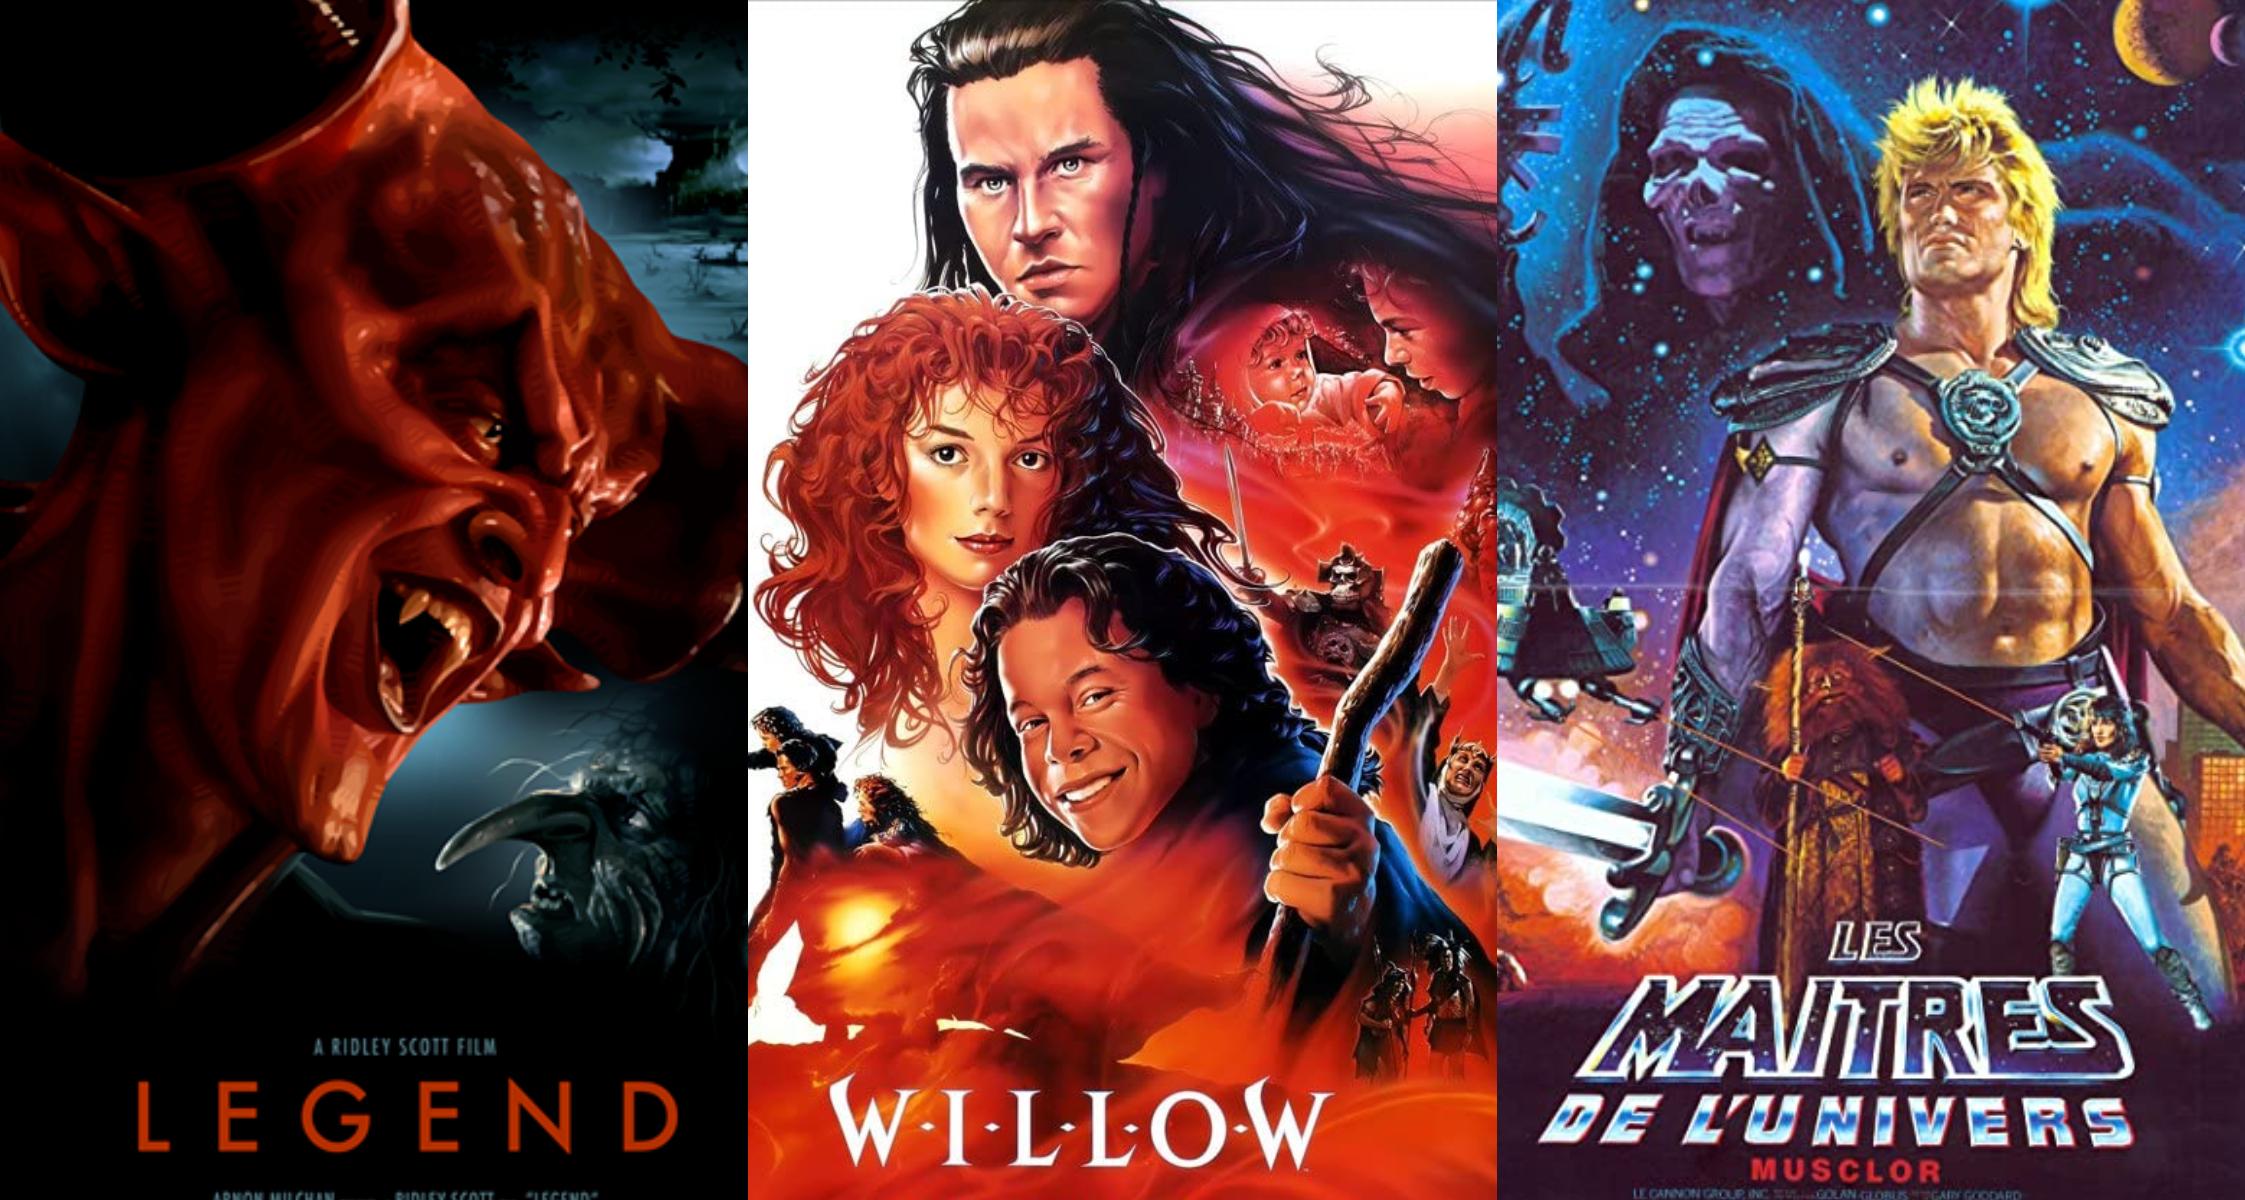 películas espada brujería 80s